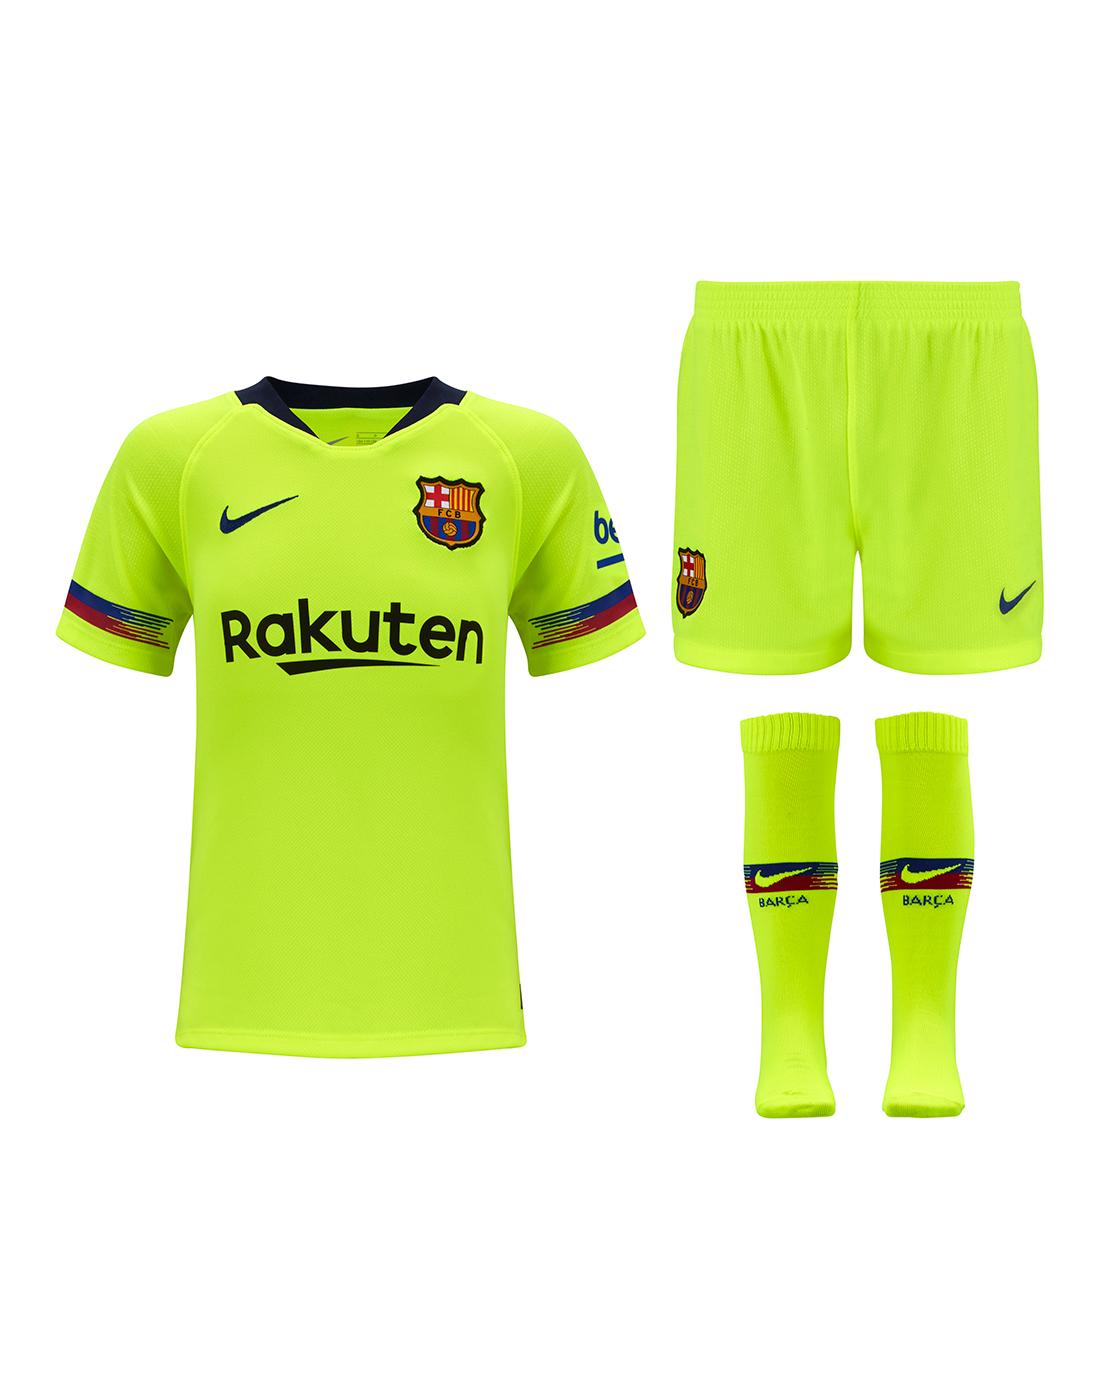 Barcelona 18 19 Away Kit Nike Life Style Sports